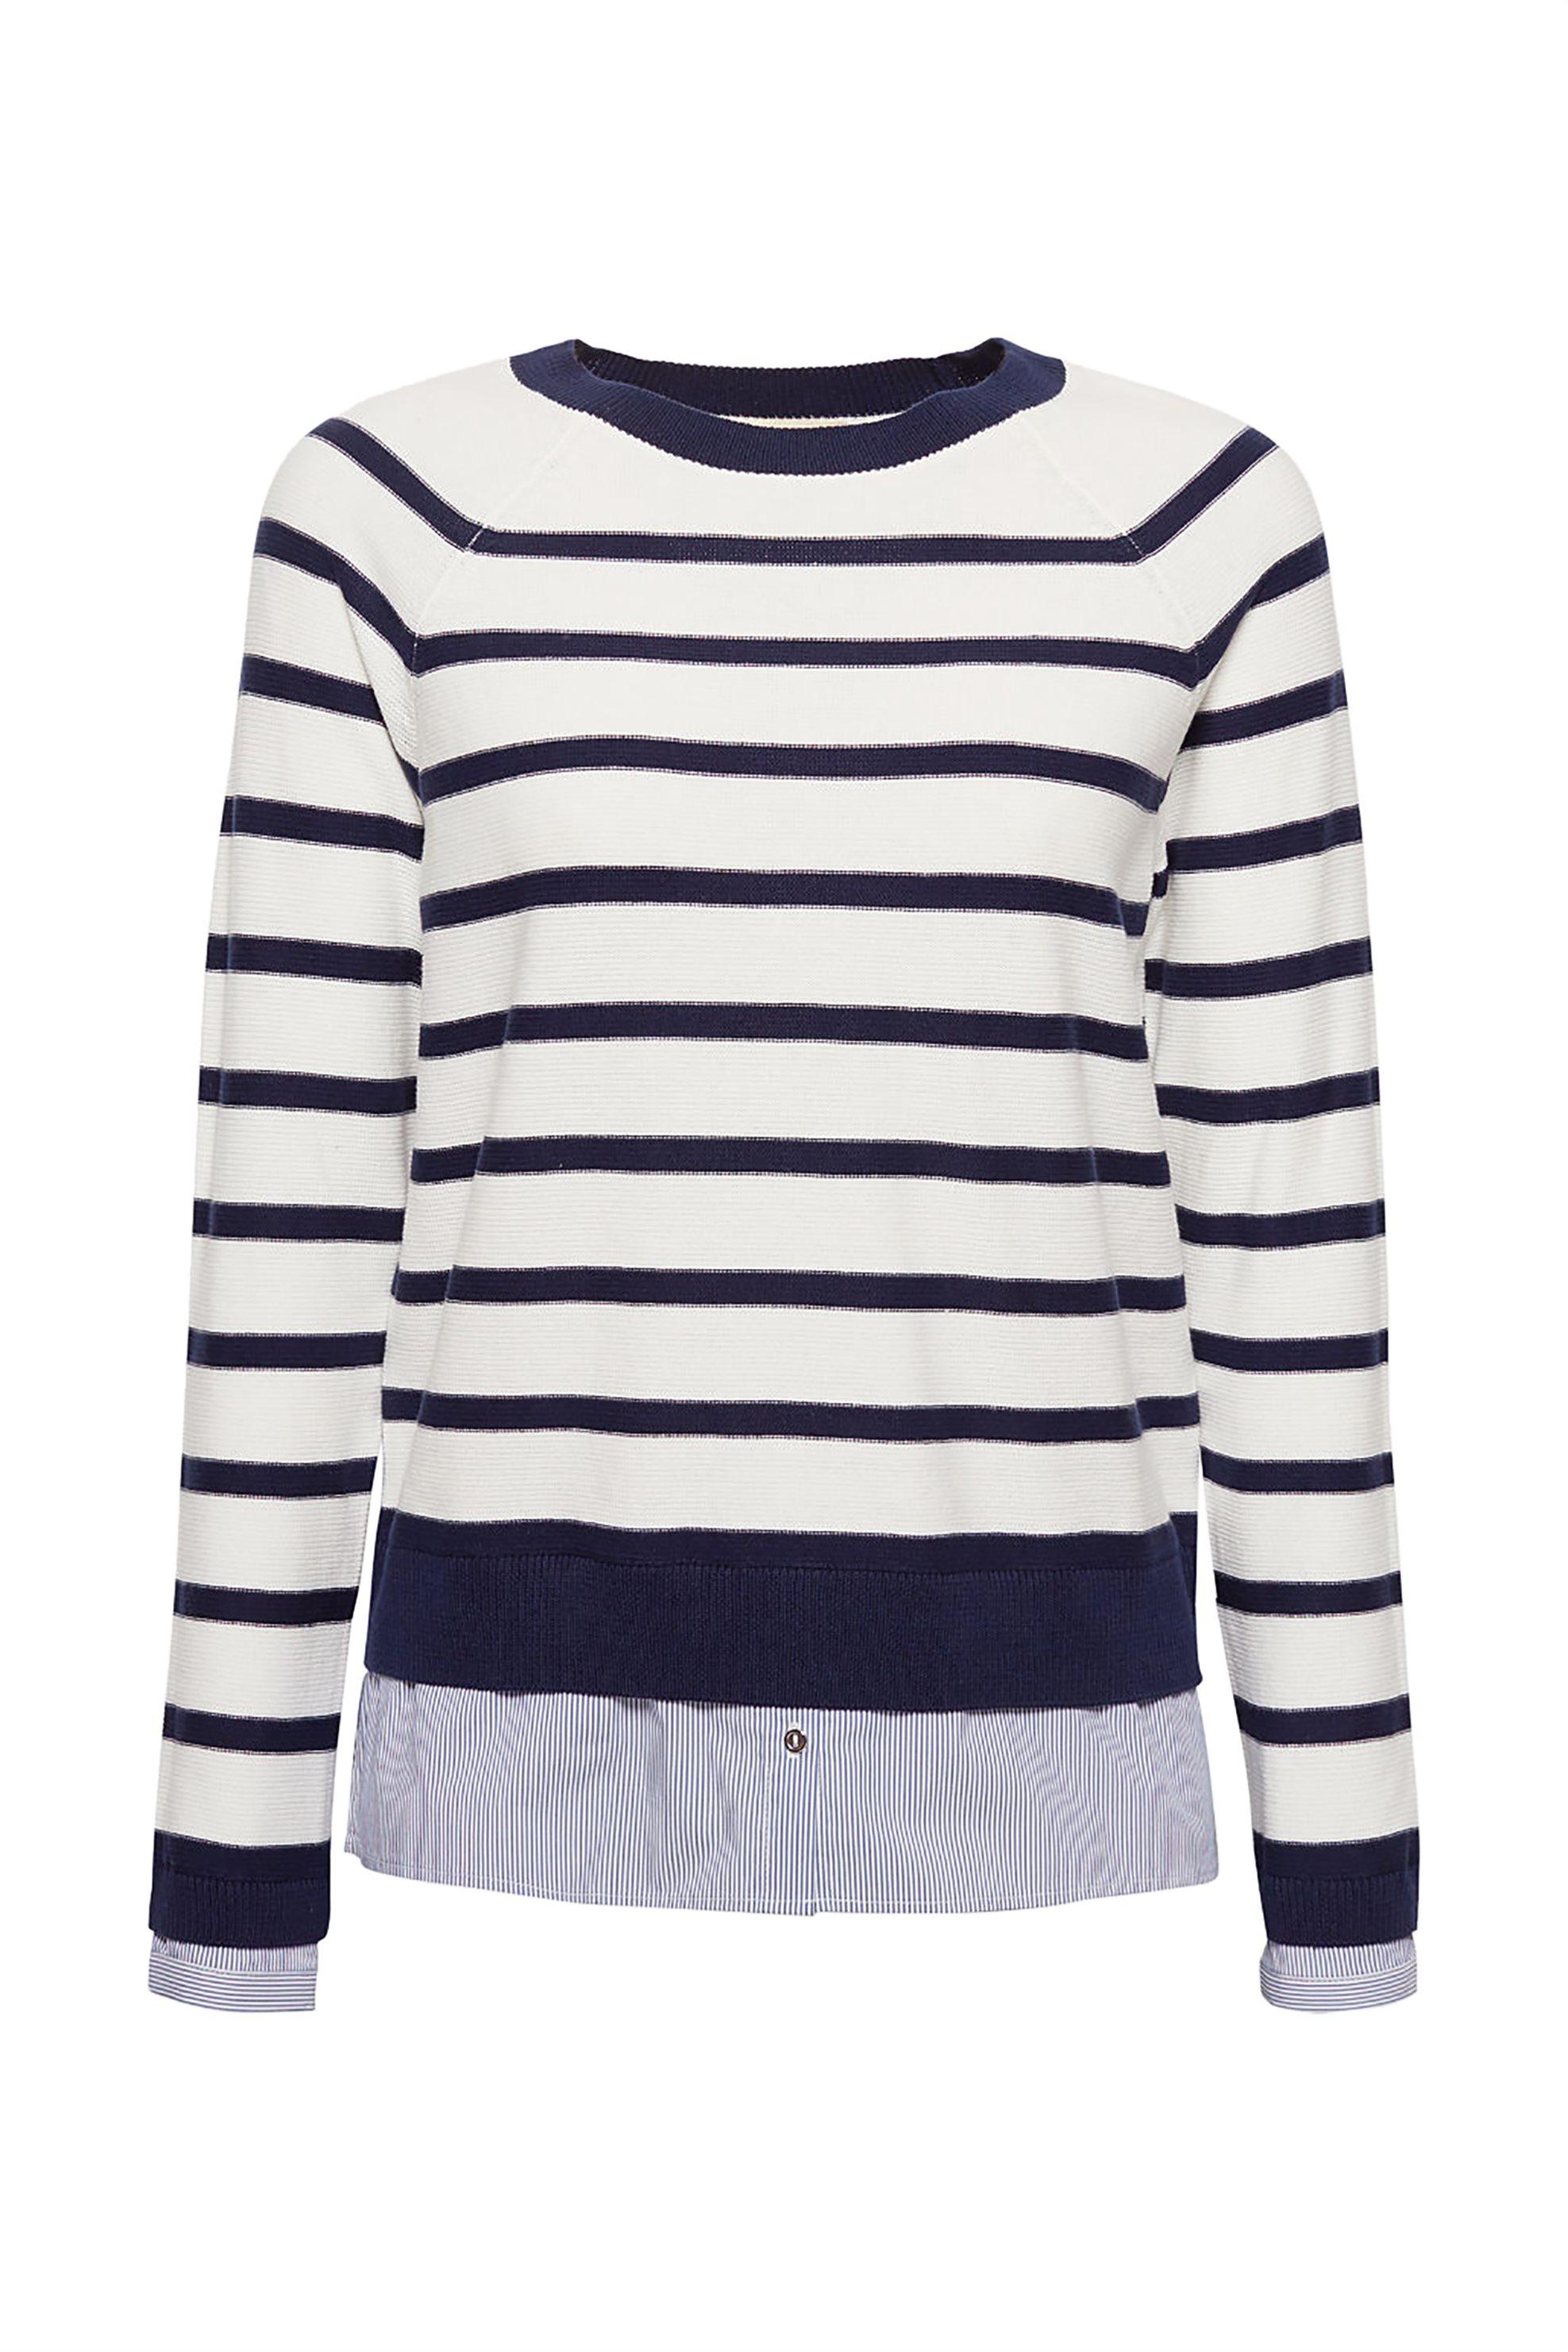 f04abfa987c4 Esprit γυναικεία ριγέ πλεκτή μπλούζα με layer - 029EE1I010 - Εκρού